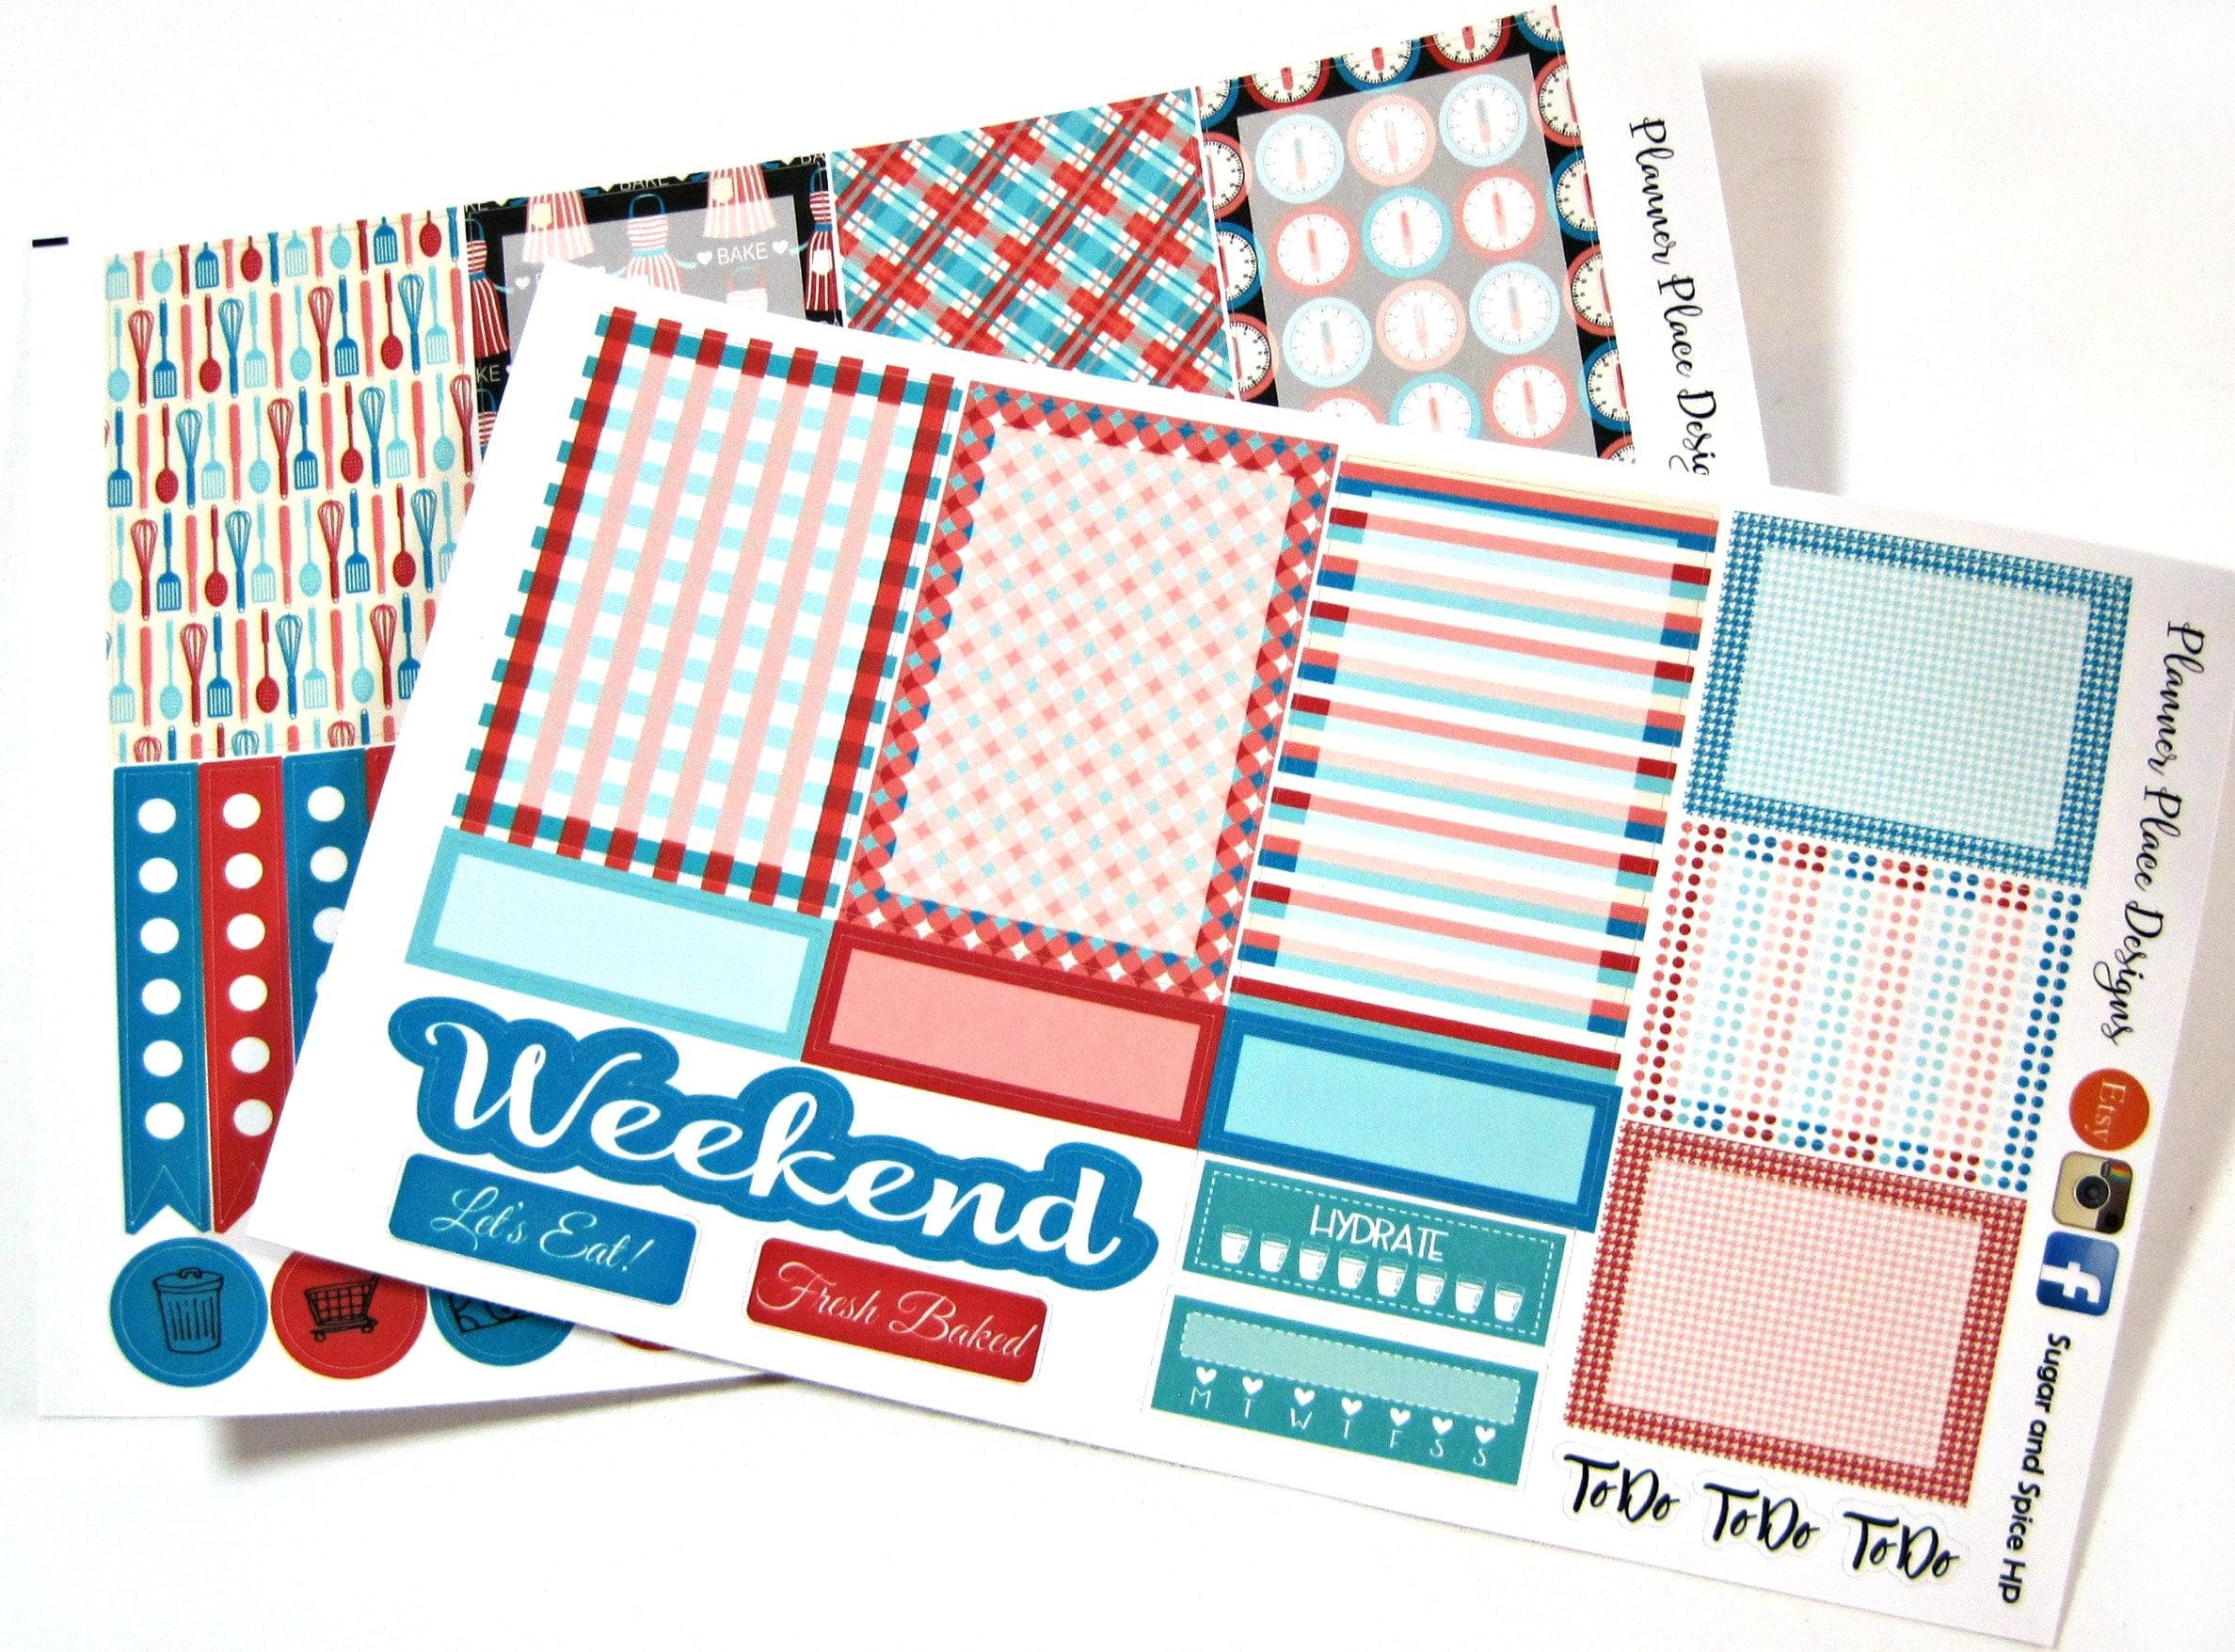 Kitchen Baking Planner Stickers -Sugar and Spice - Weekly Planner ...